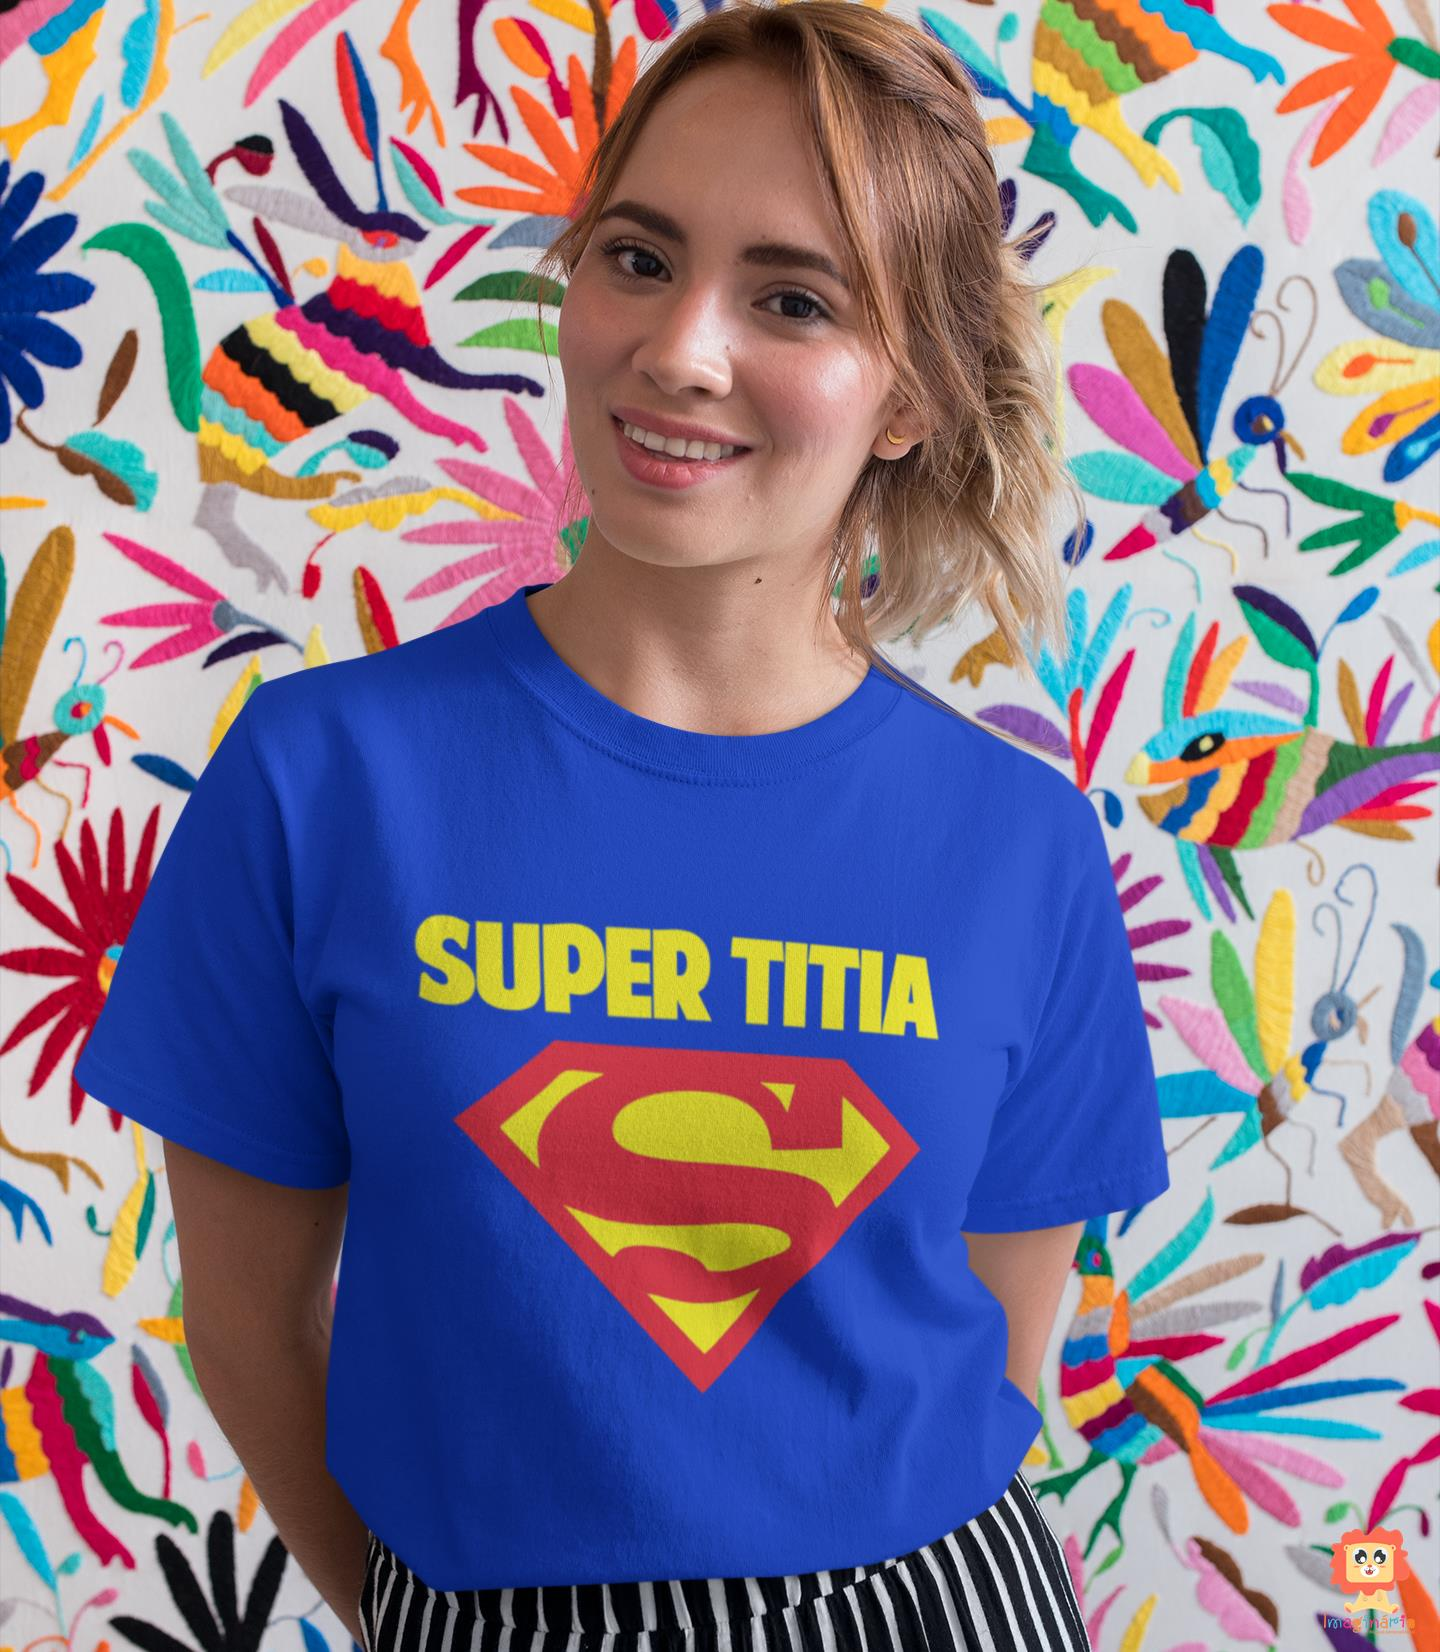 Camiseta Heroina Super Titia